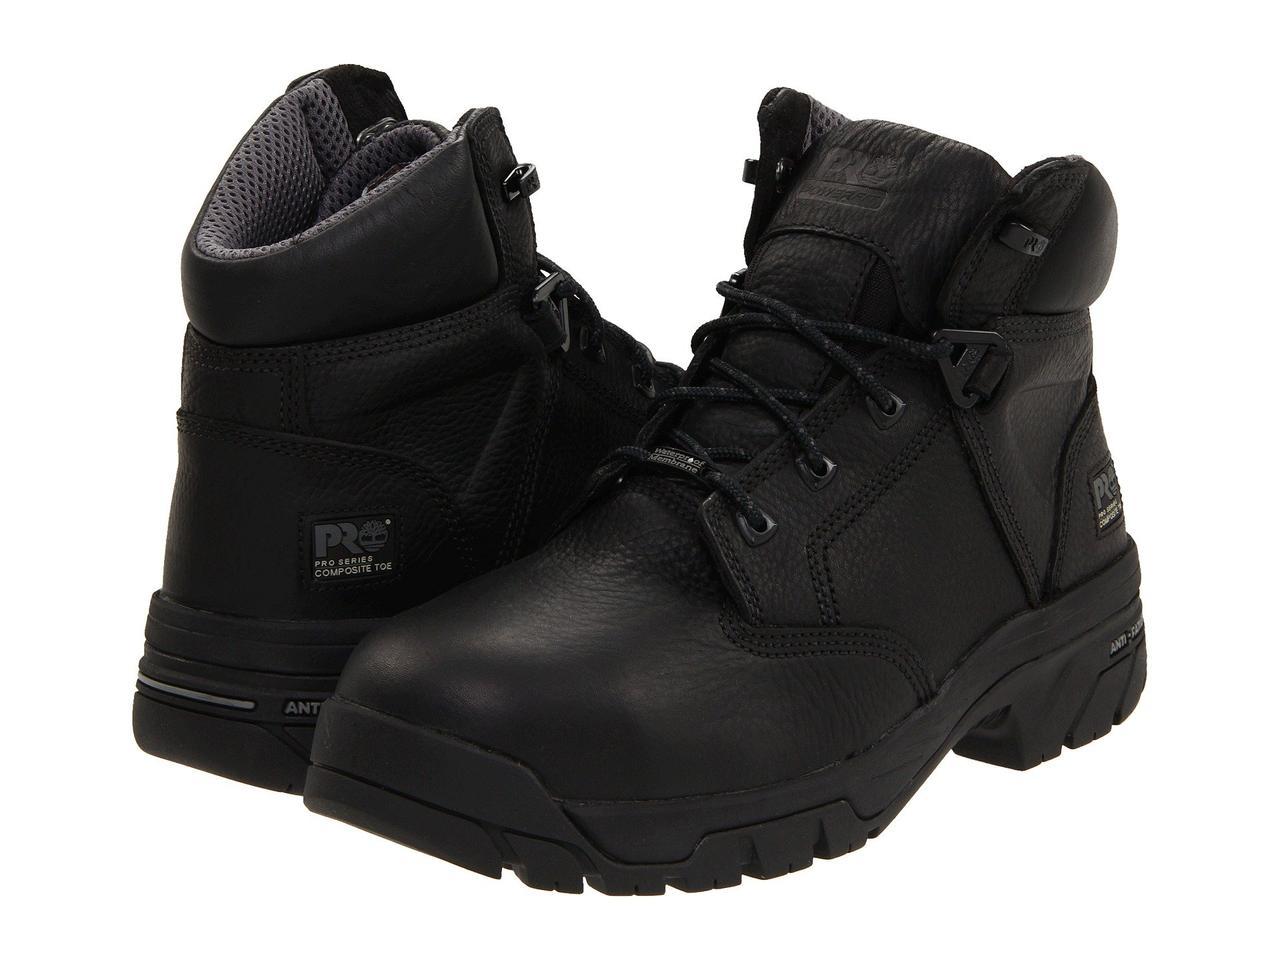 "Ботинки/Сапоги (Оригинал) Timberland PRO Helix 6"" Waterproof Composite Toe Black"